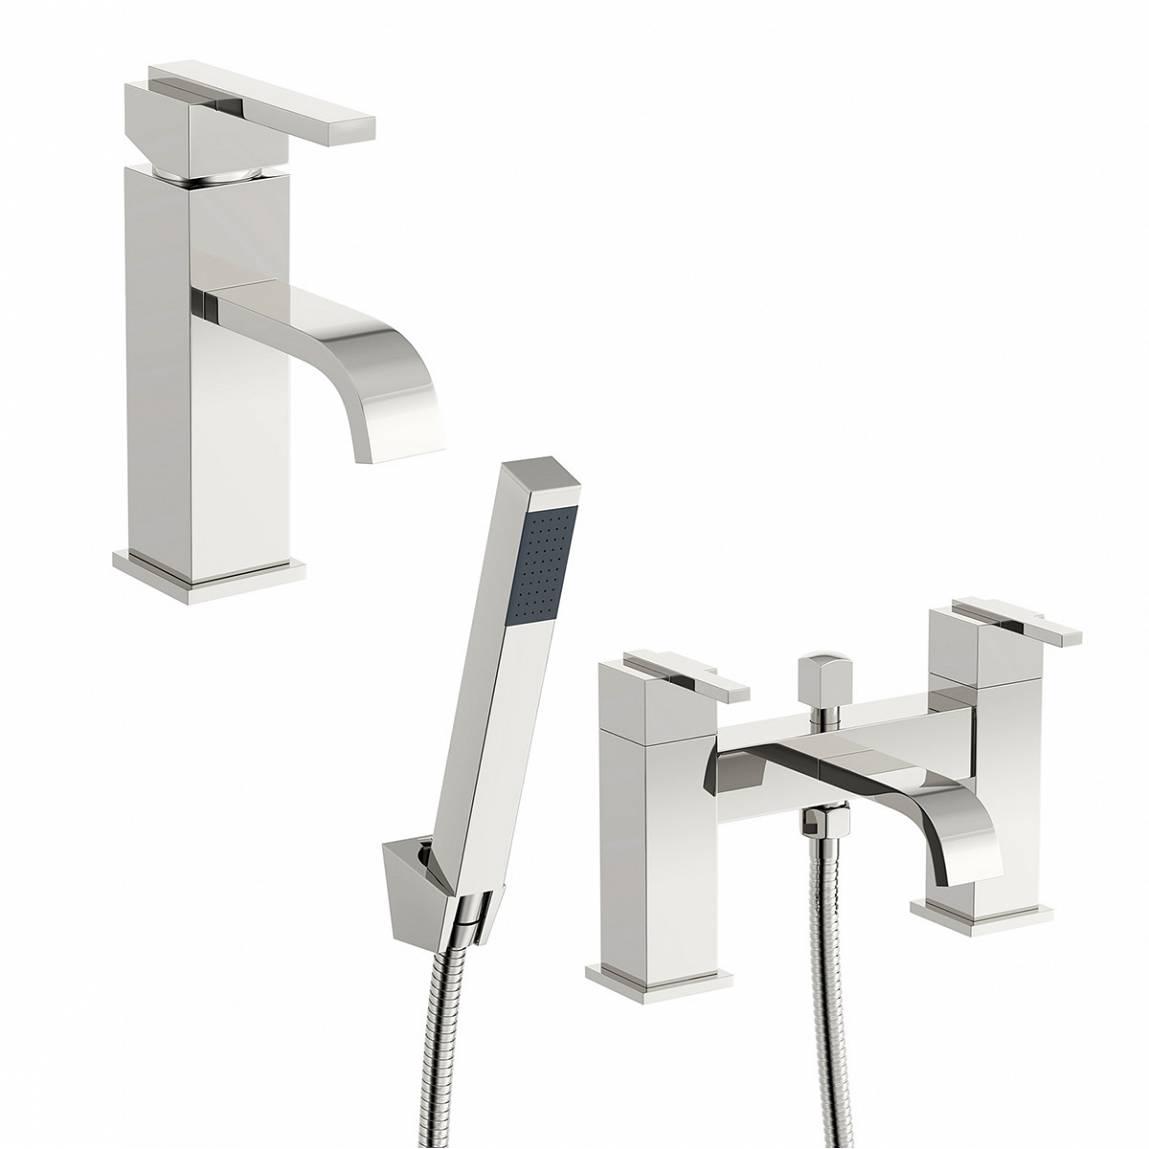 Image of Ridge Basin and Bath Shower Mixer Pack